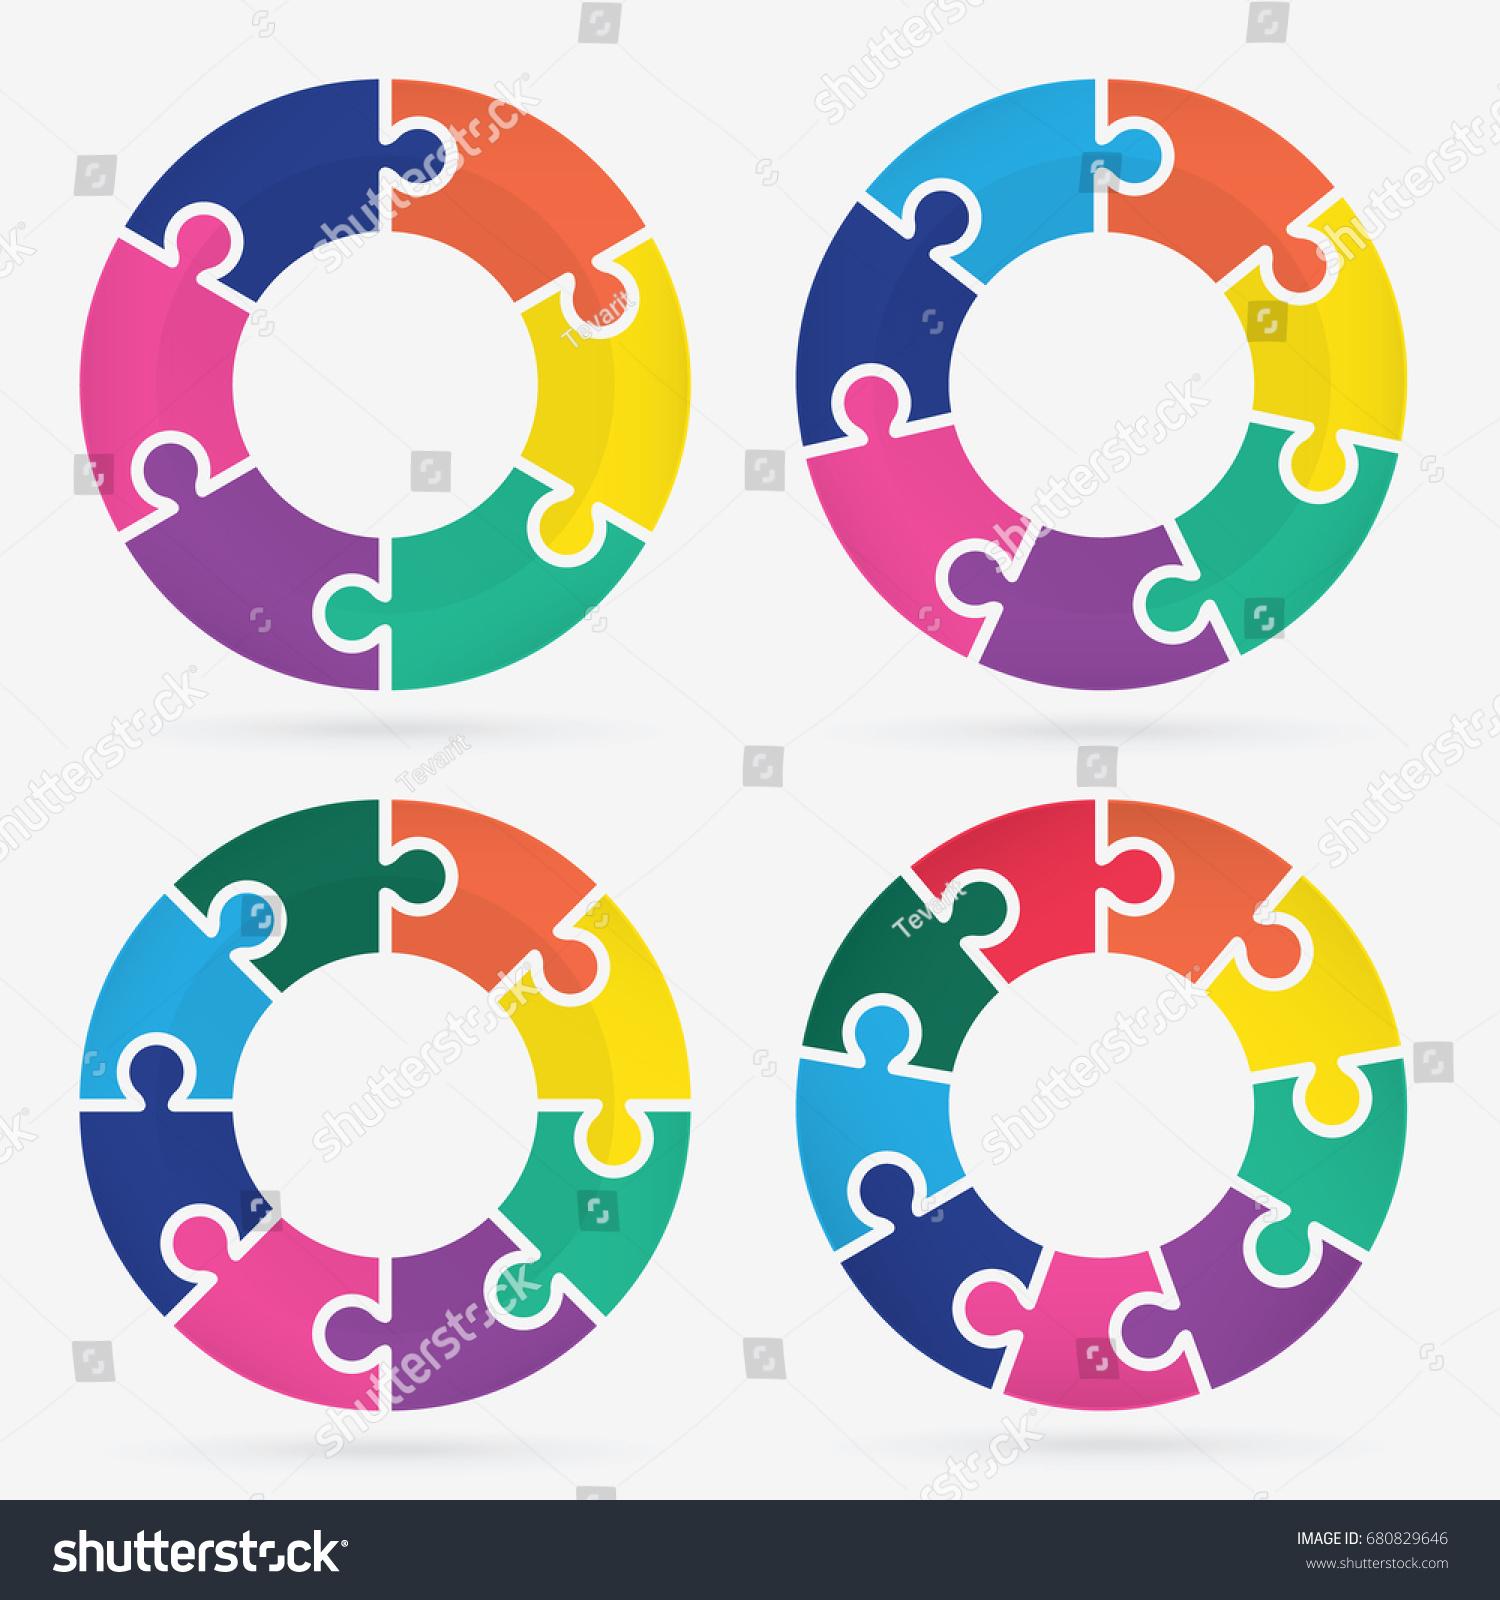 7 piece pie chart choice image free any chart examples 7 piece pie chart images free any chart examples 7 piece pie chart images free any nvjuhfo Images